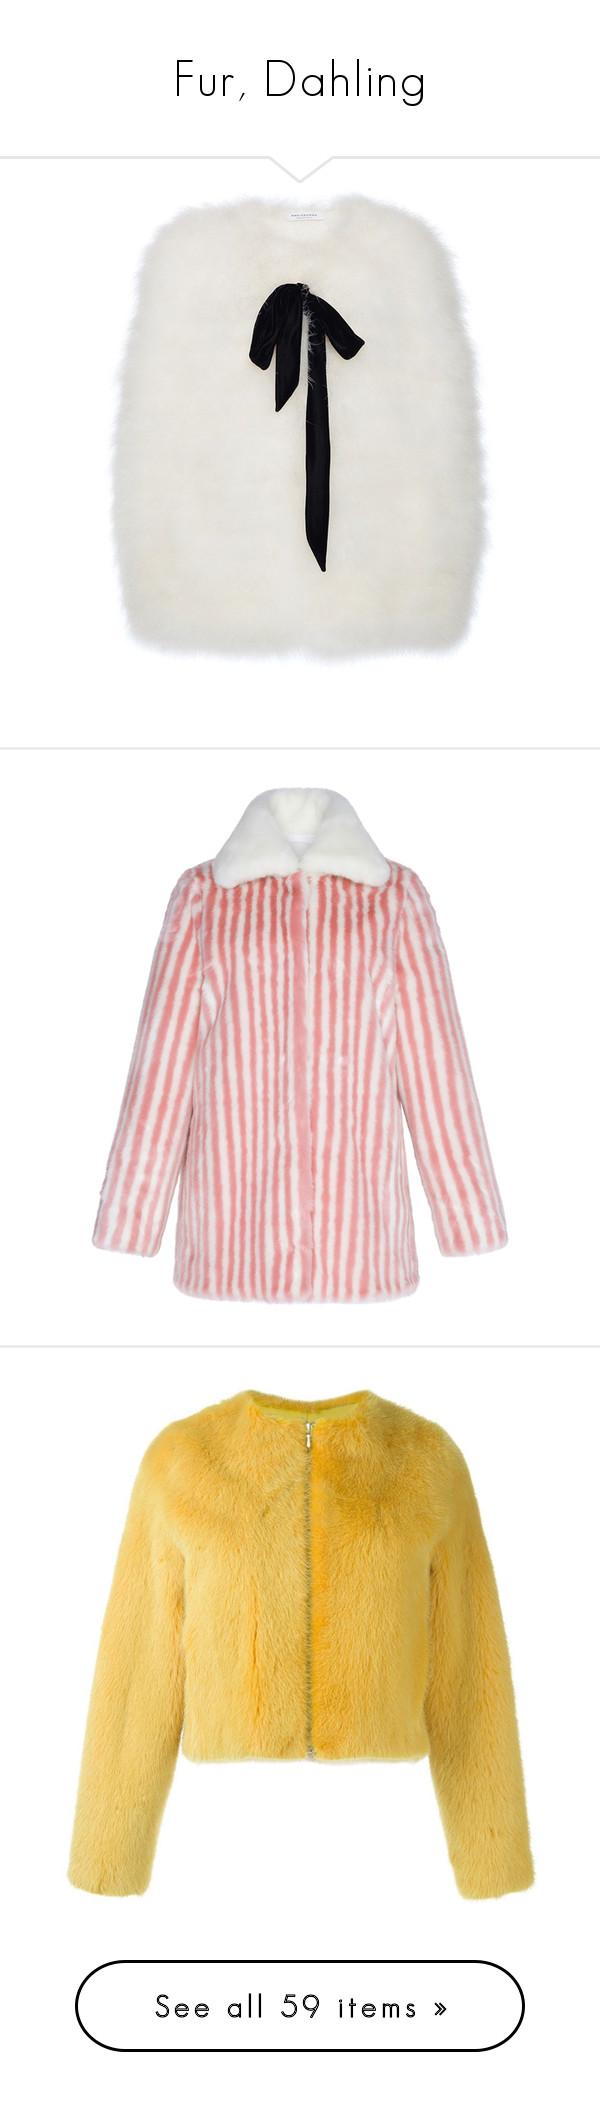 """Fur, Dahling"" by carolines-closet ❤ liked on Polyvore featuring outerwear, cape, coats, fur cape, cape coat, fur cape coat, pink, marco de vincenzo, fake fur coats and pink faux fur coat"